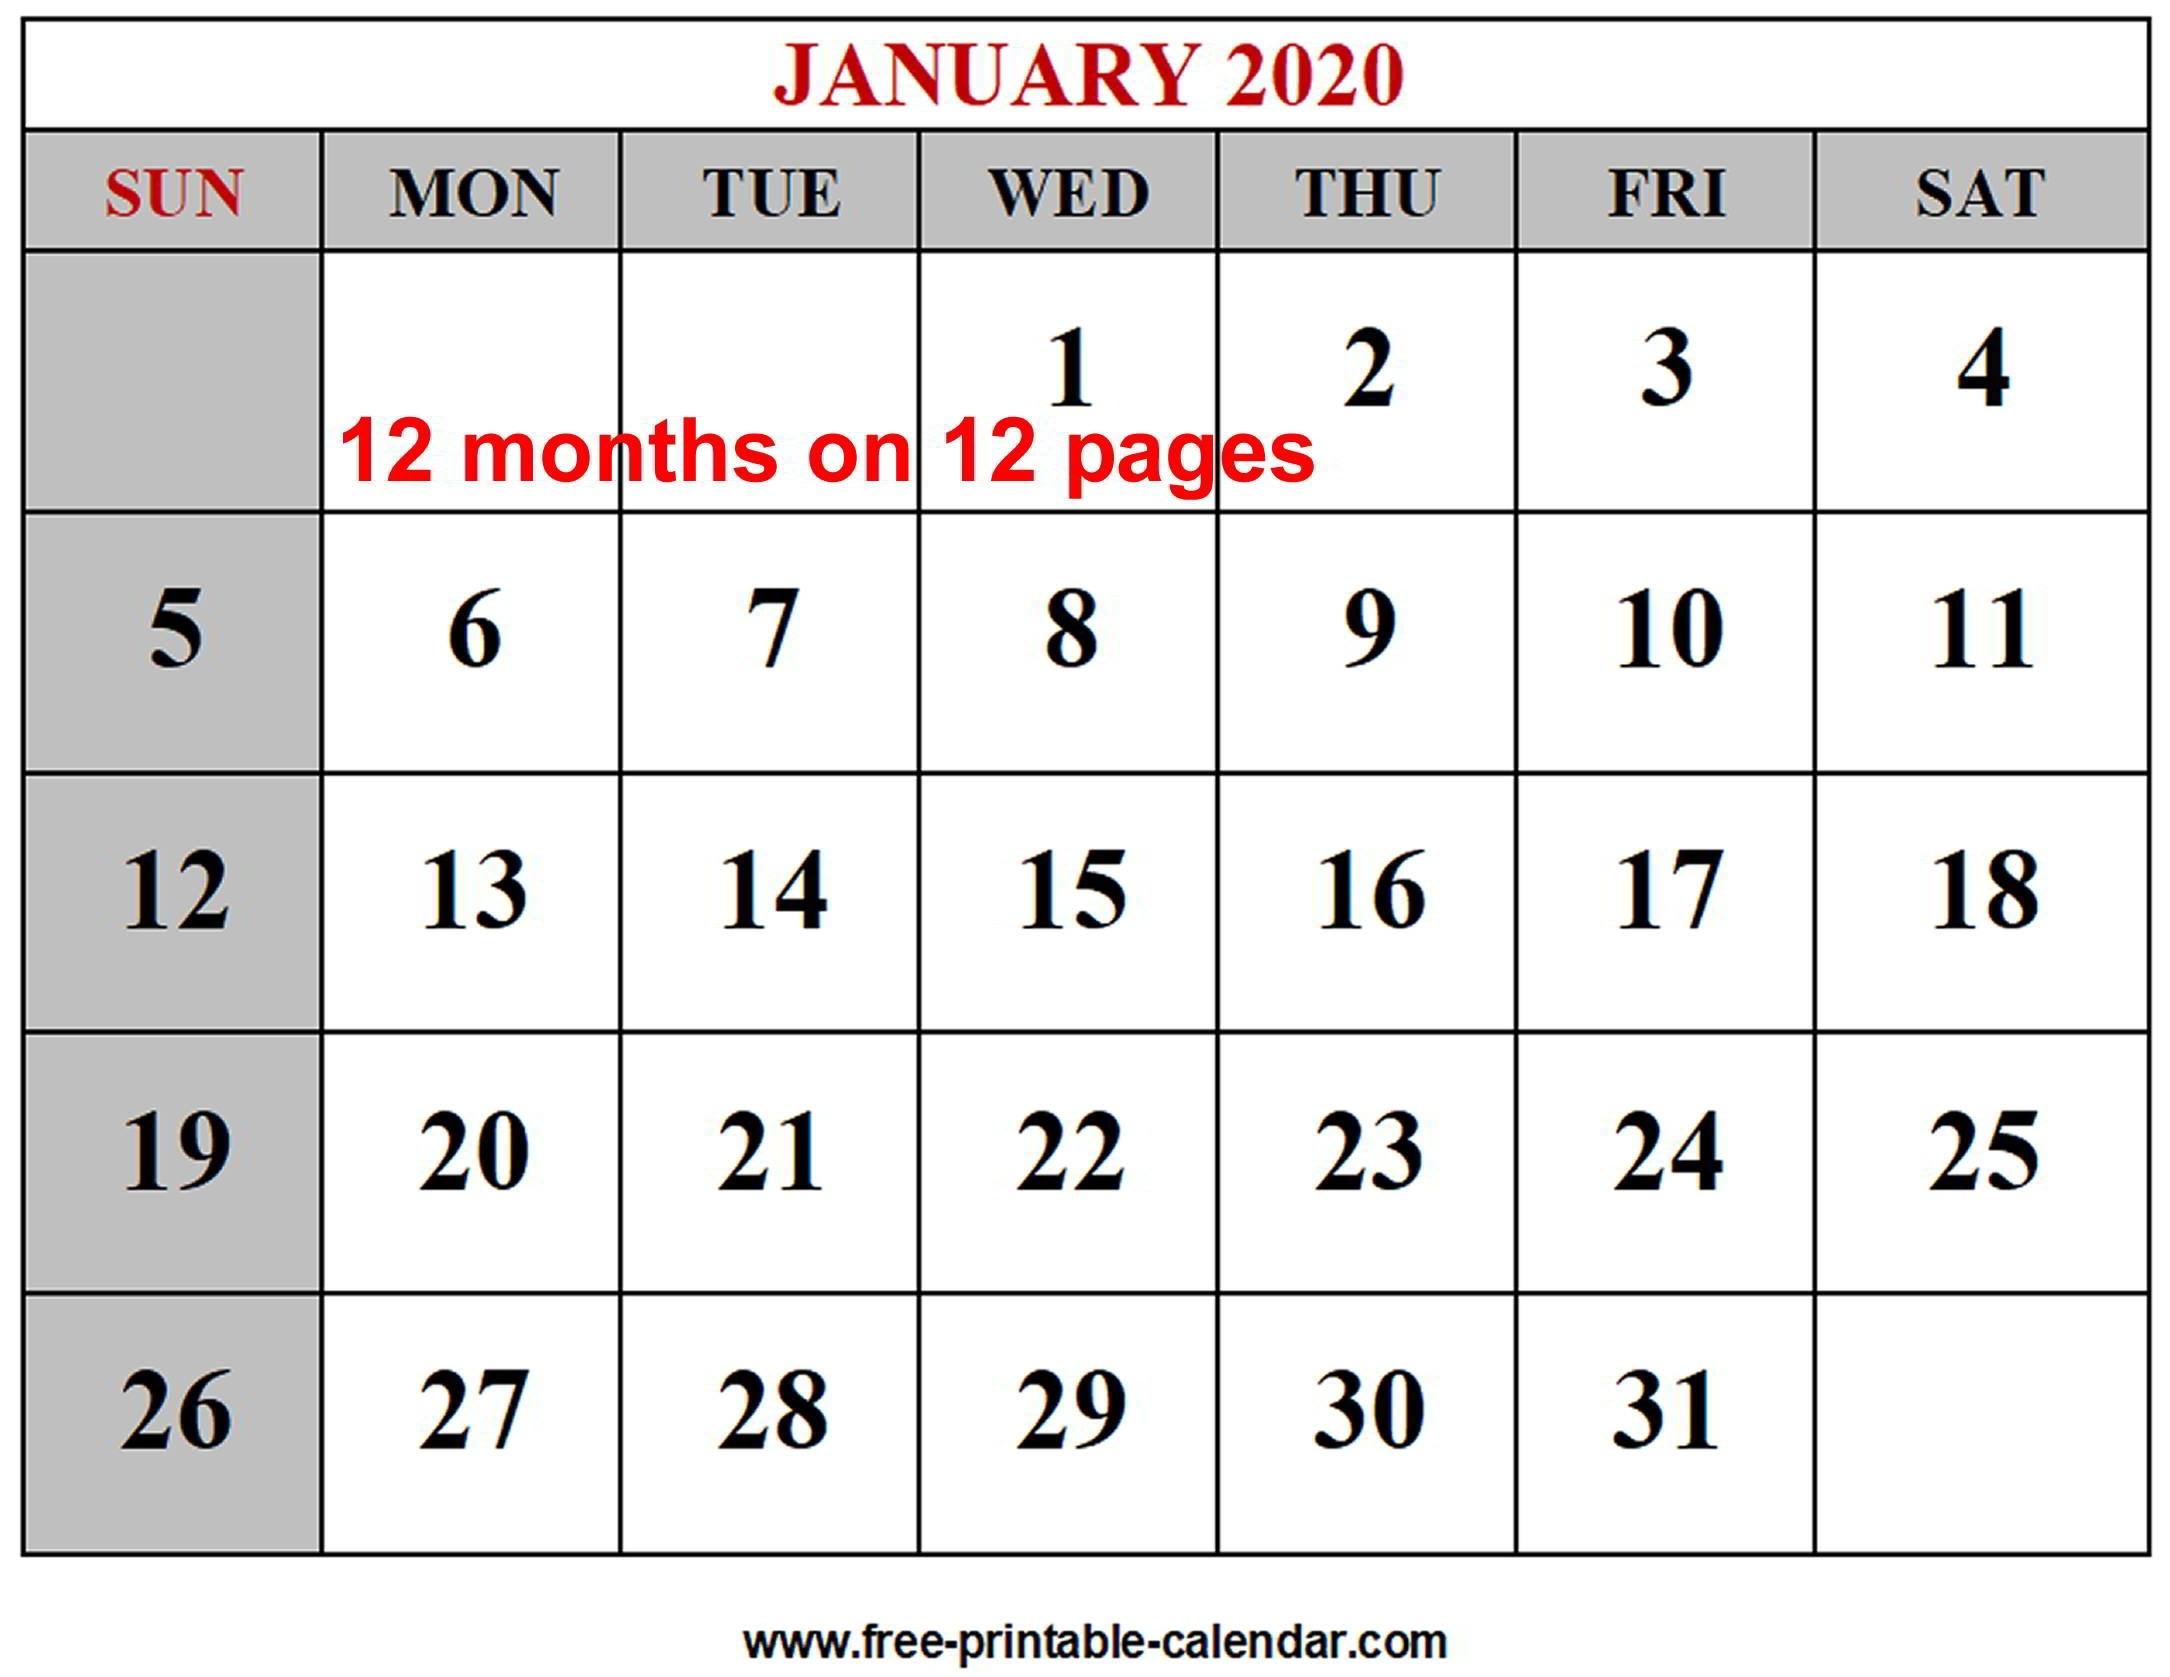 Year 2020 Calendar Templates - Free-Printable-Calendar  2020 Free 12 Month Printable Monthly Calendar